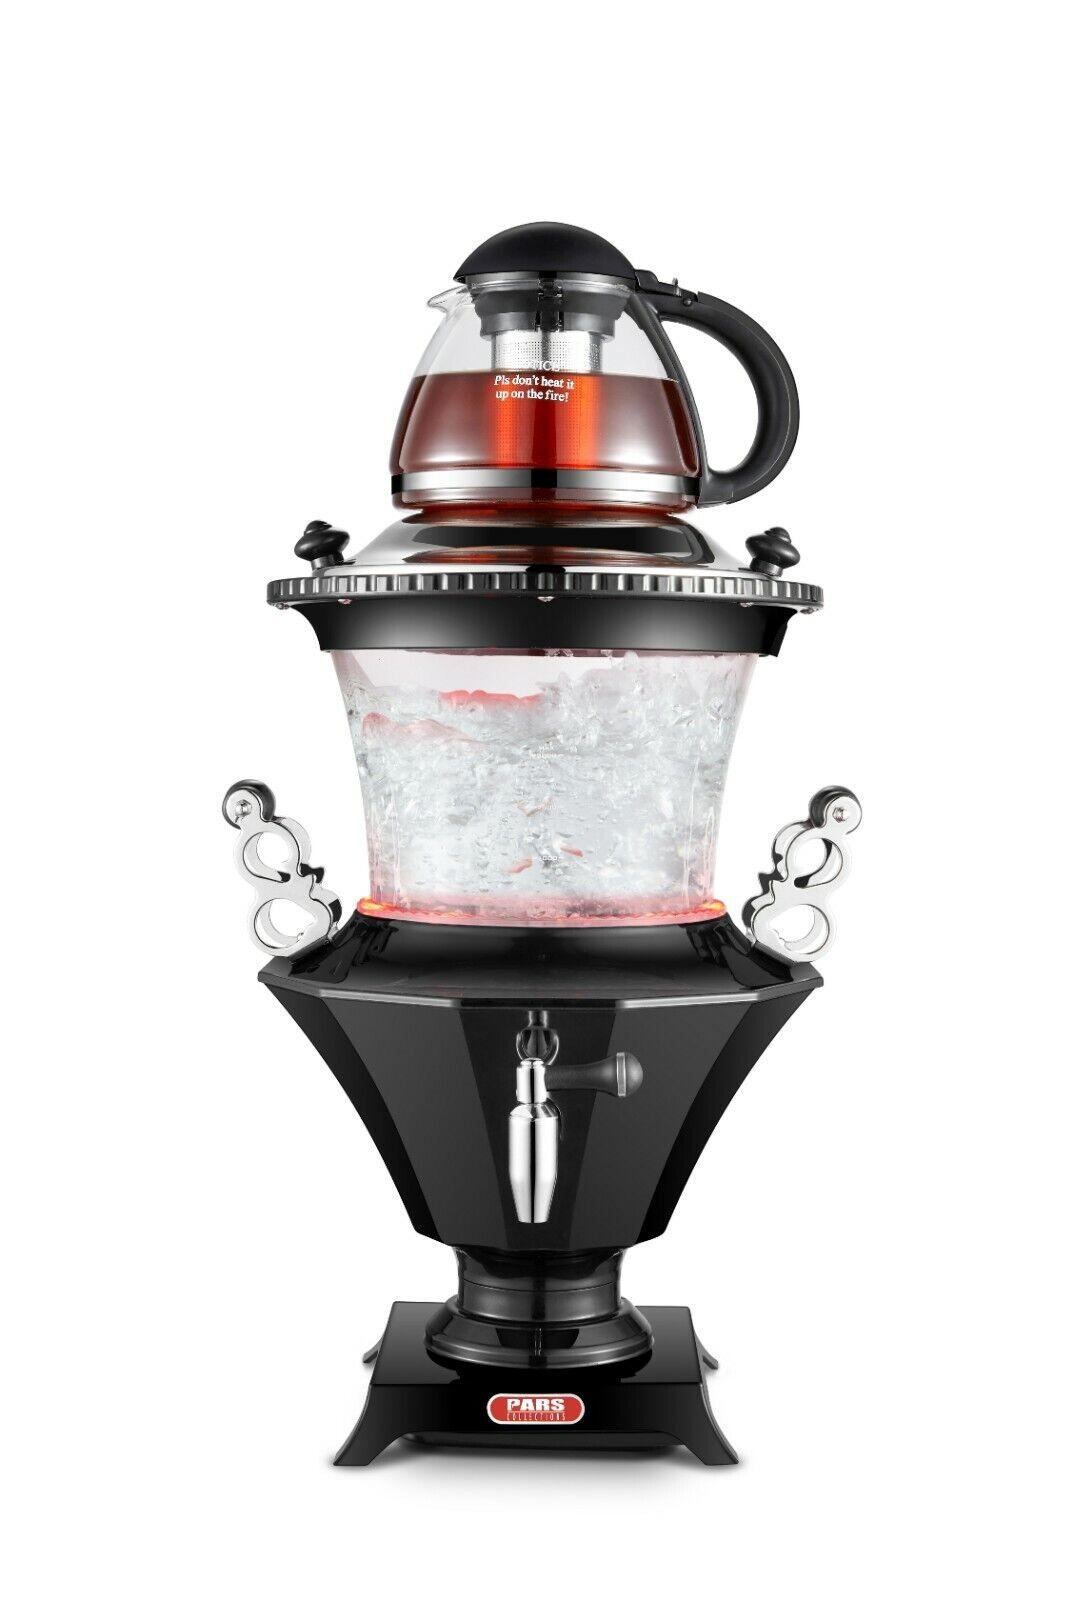 New 2019 Modern Electric Glass Samovar Tea Maker, Stainless